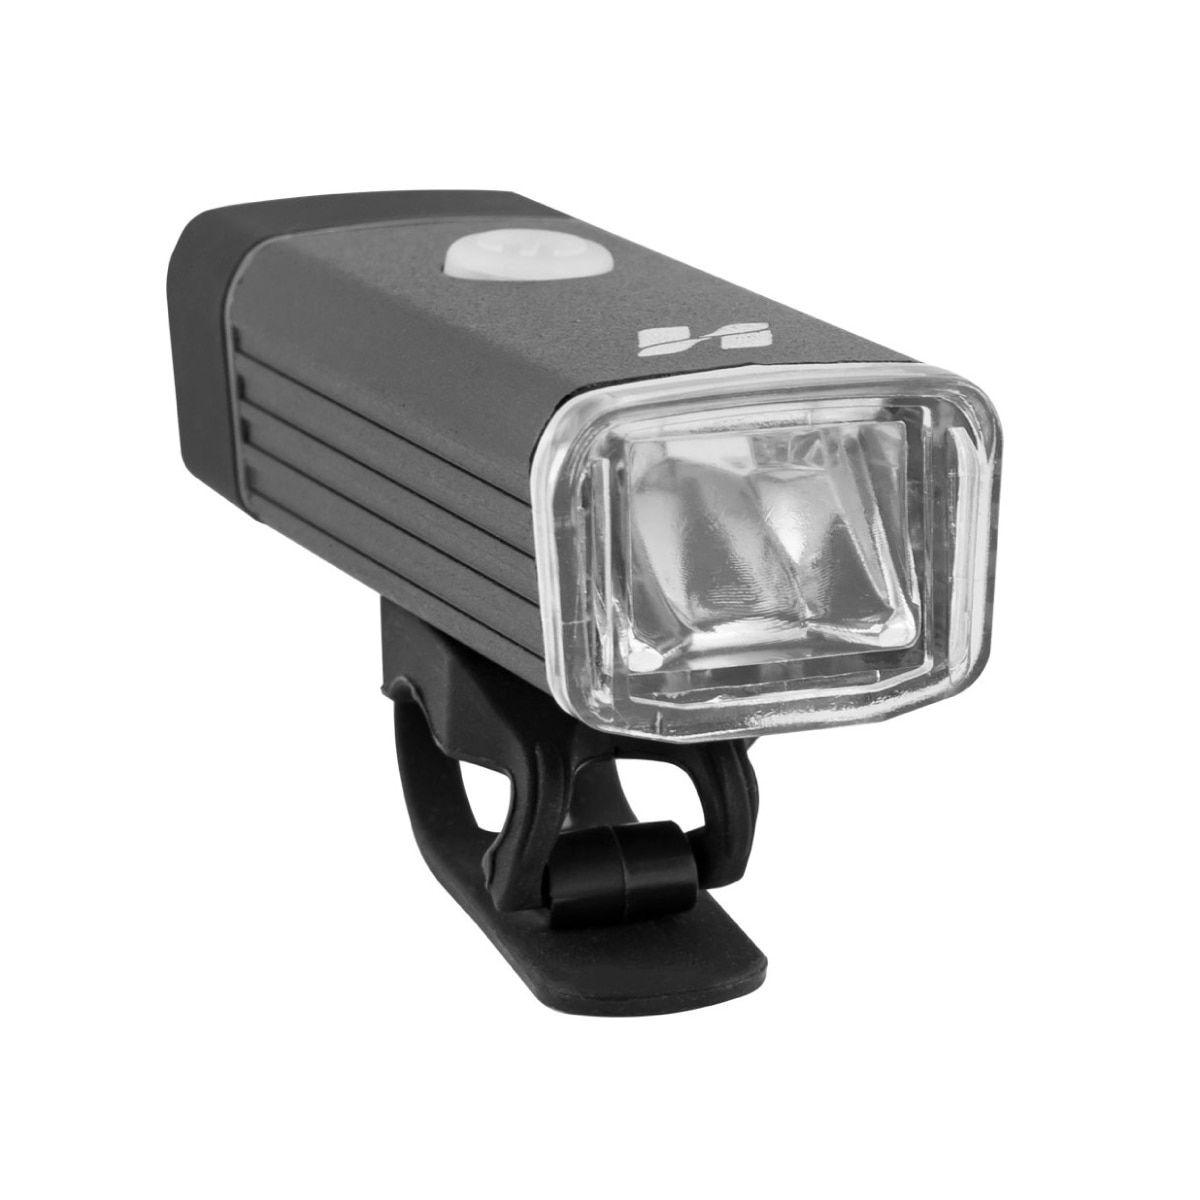 Kit High One MTB Farol 180 Lumens + Vista Ligth 5 Funções USB